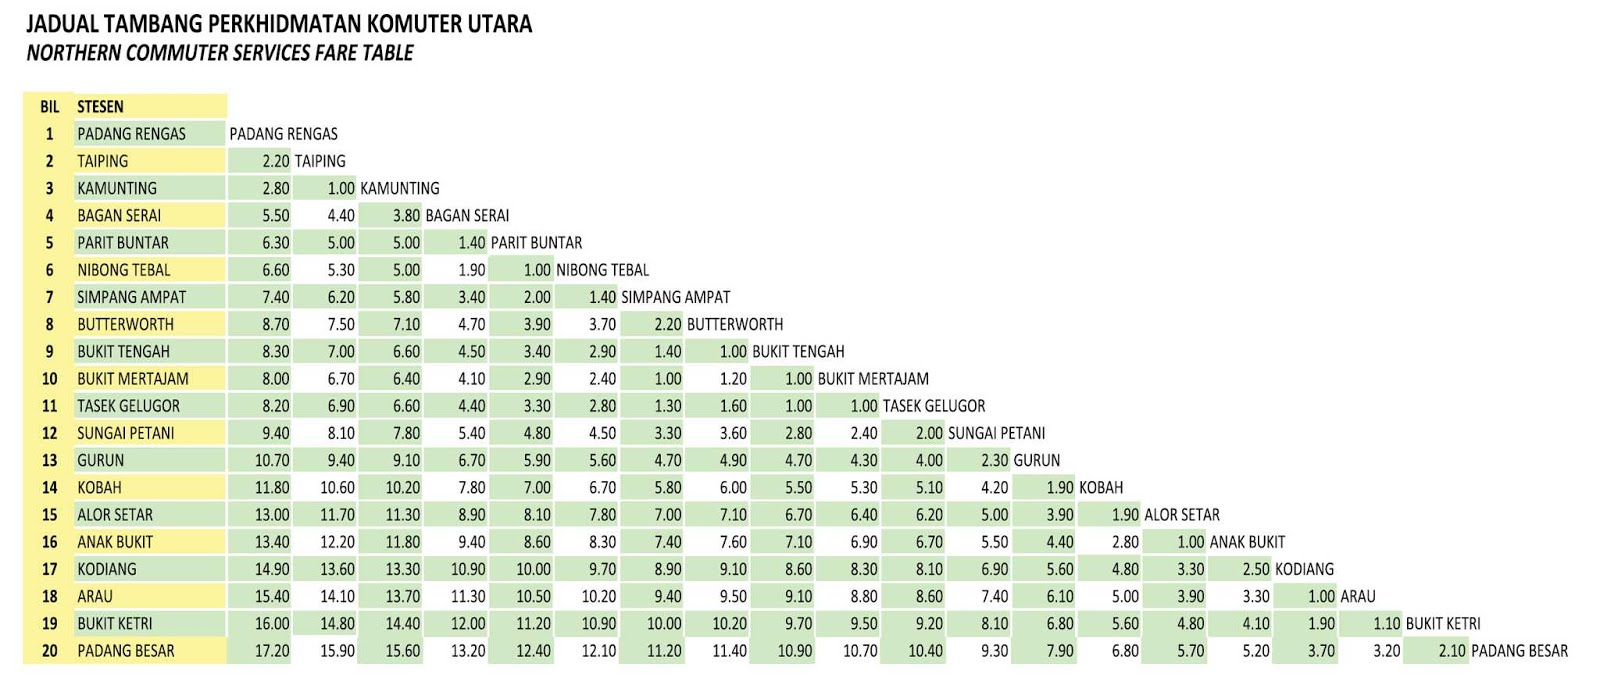 Jadual Tambang Padang Rengas - Padang Besar - Padang Rengas